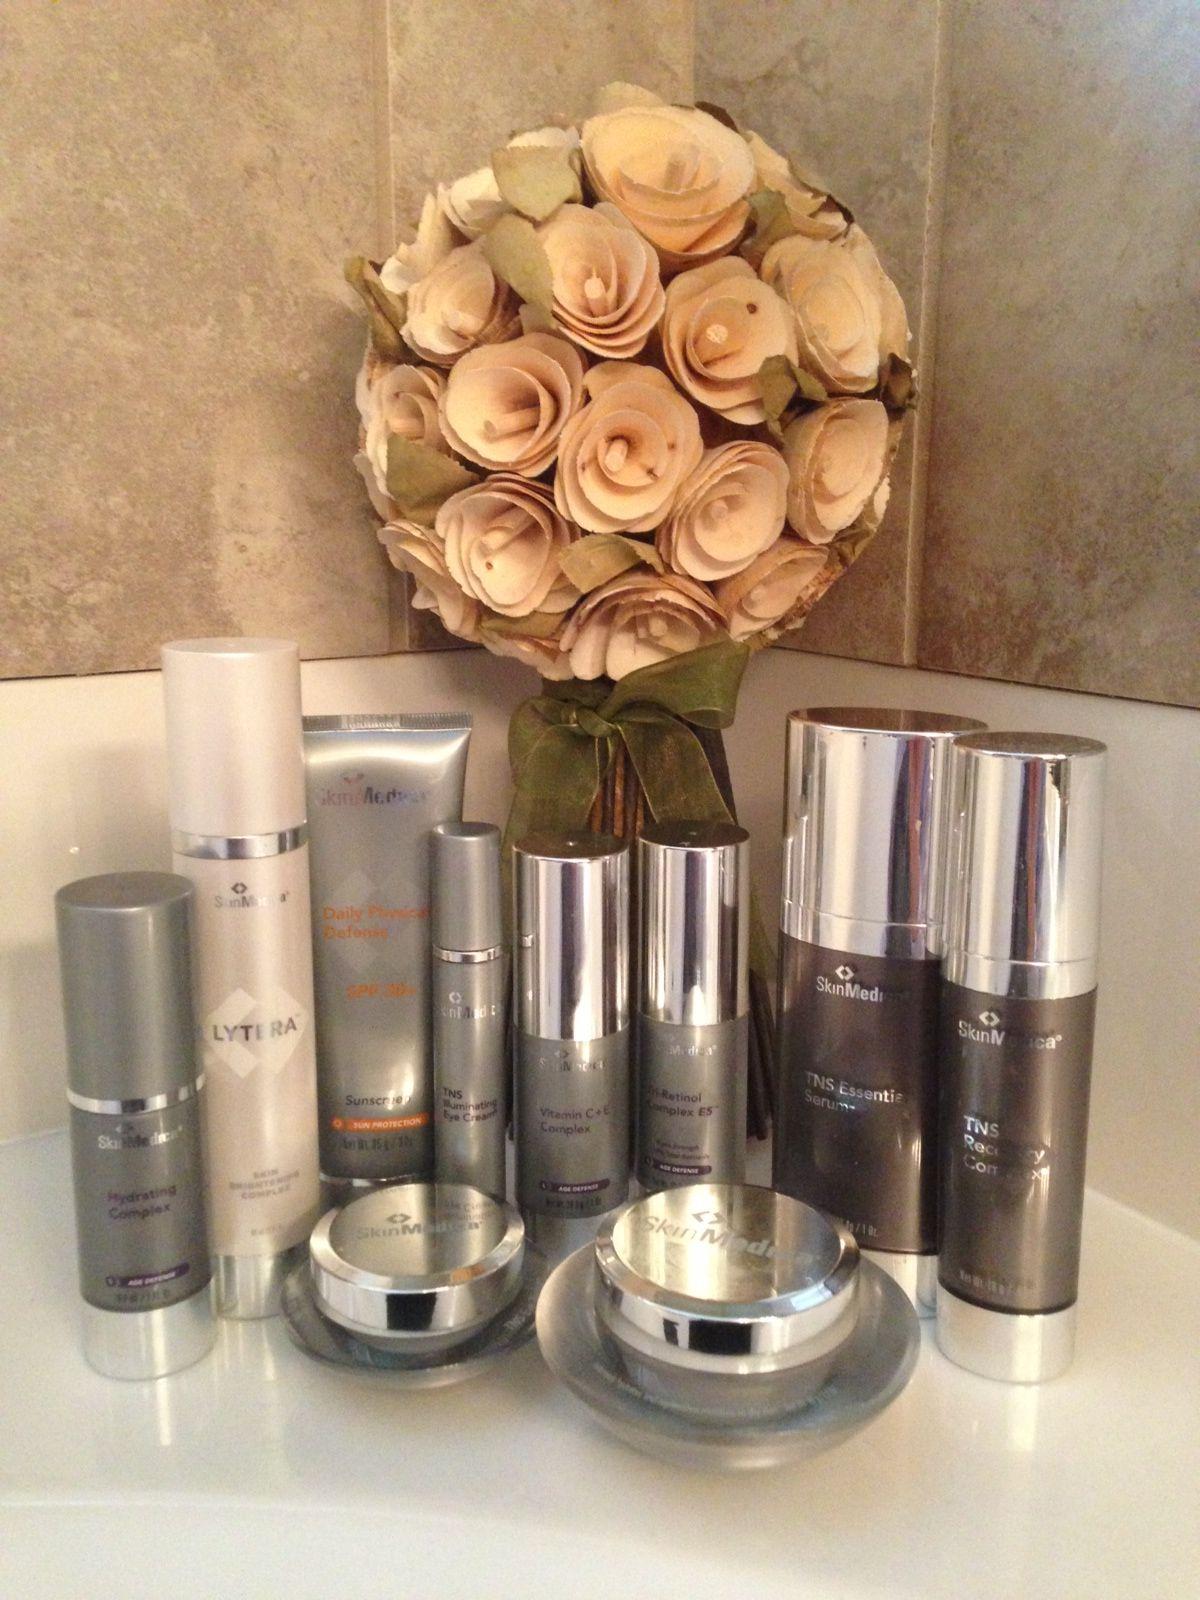 Flowers Highlight This #SkinMedica Display. #bathrooms #skincare